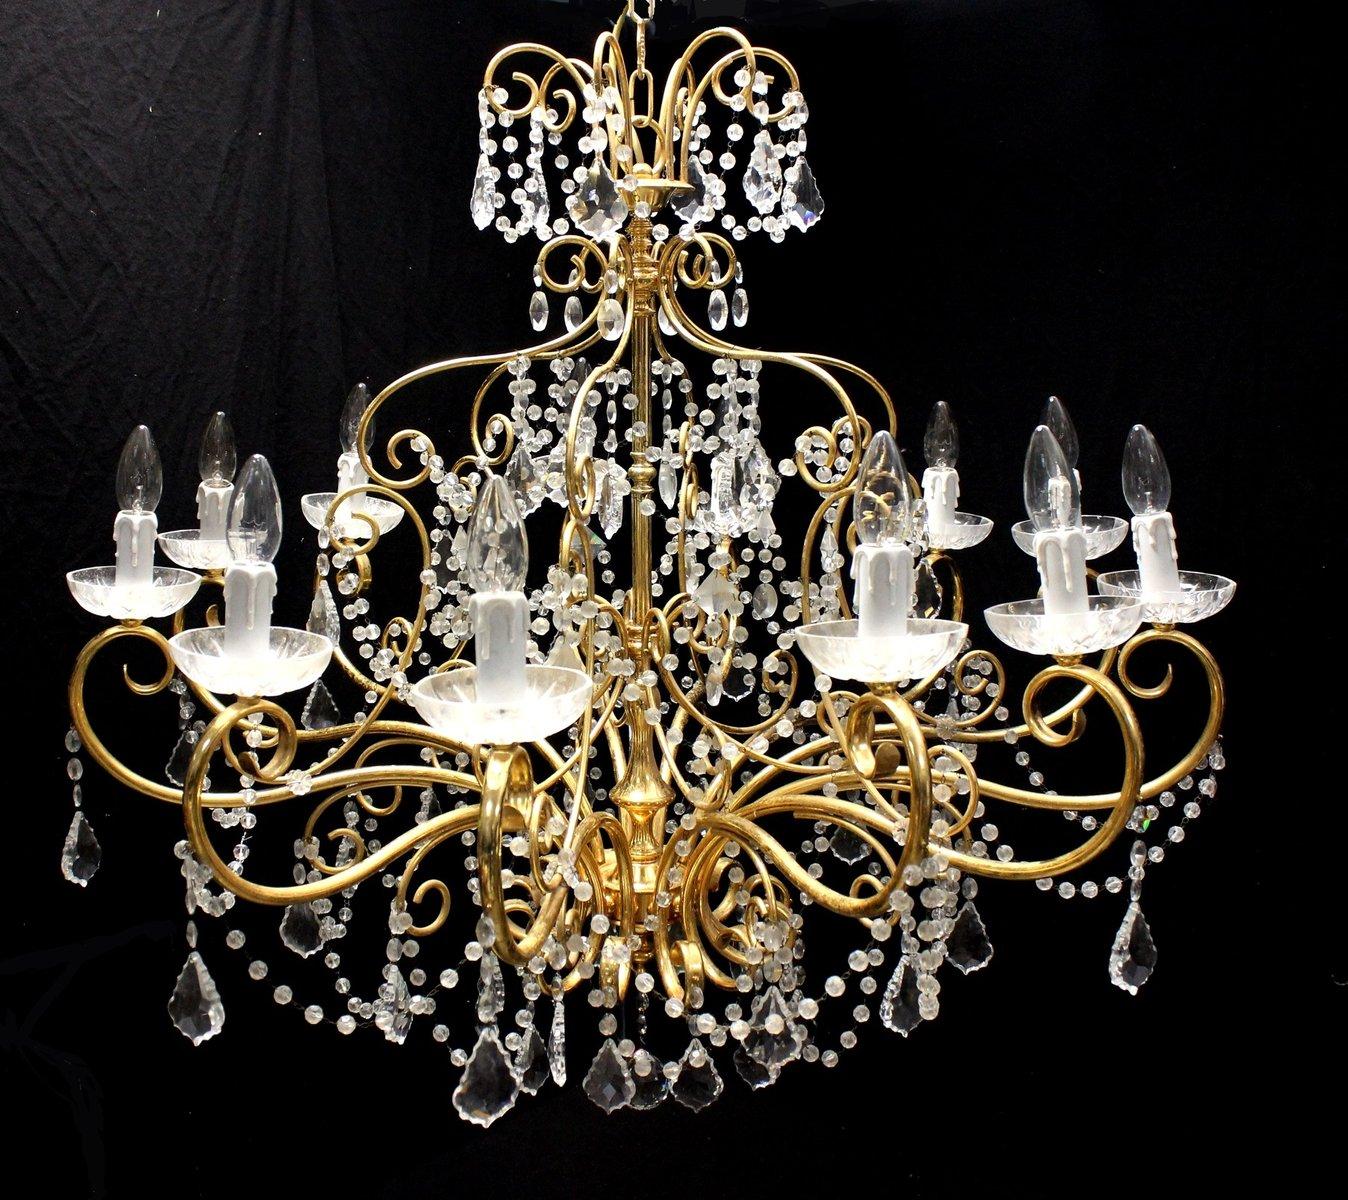 Vintage gold chandelier with swarovski crystal drops from strass vintage gold chandelier with swarovski crystal drops from strass 1980s aloadofball Gallery